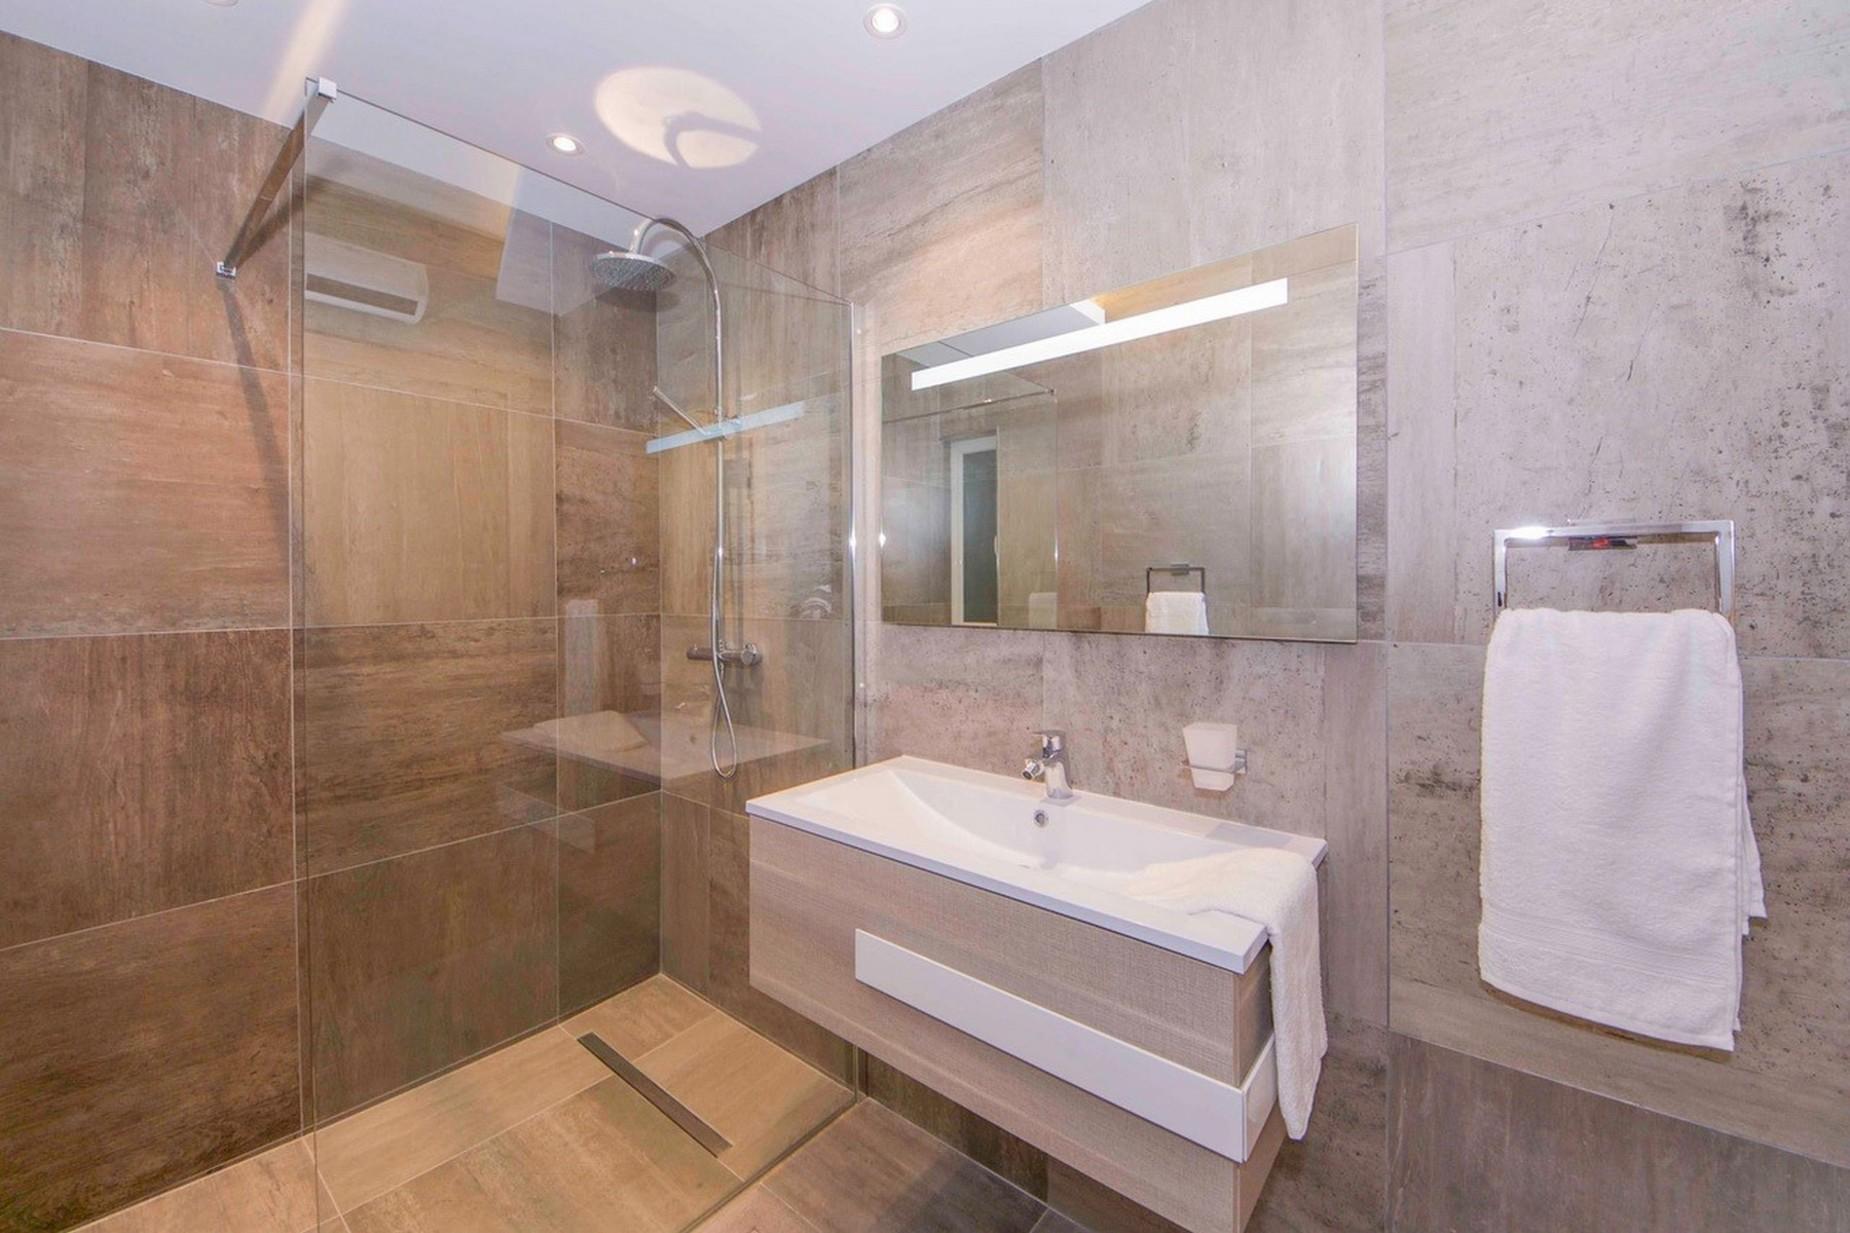 2 bed Apartment For Rent in Qawra, Qawra - thumb 11